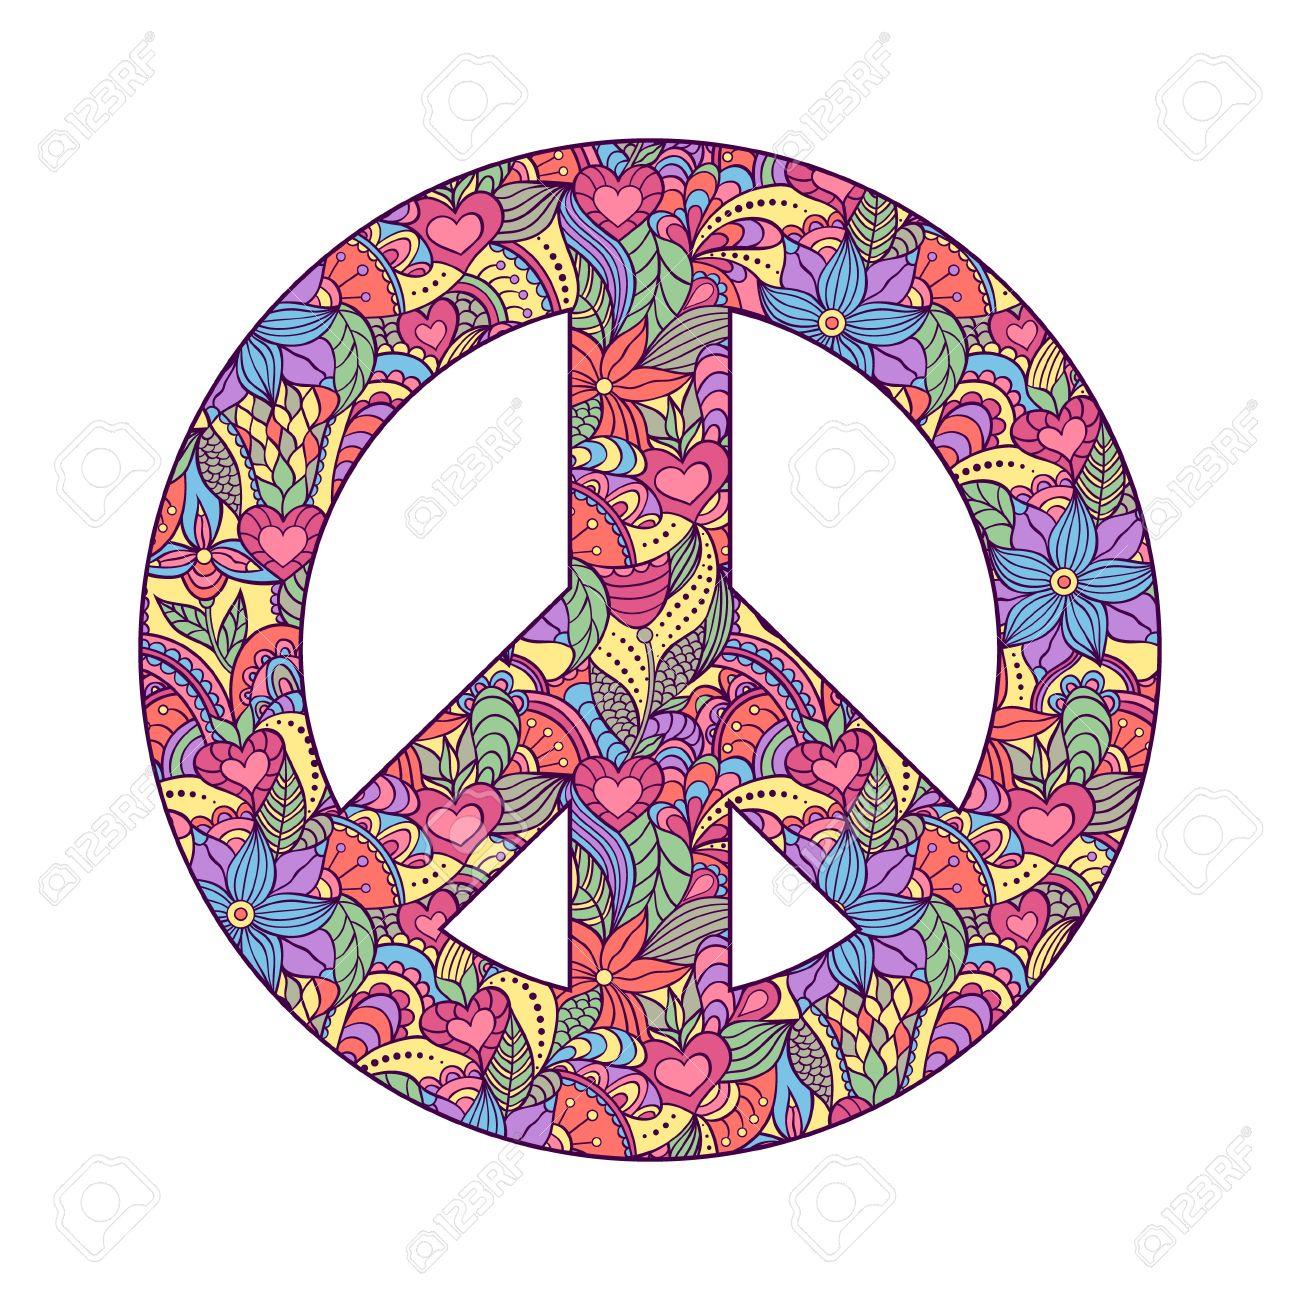 Illustration Of Colorful Peace Symbol On White Background